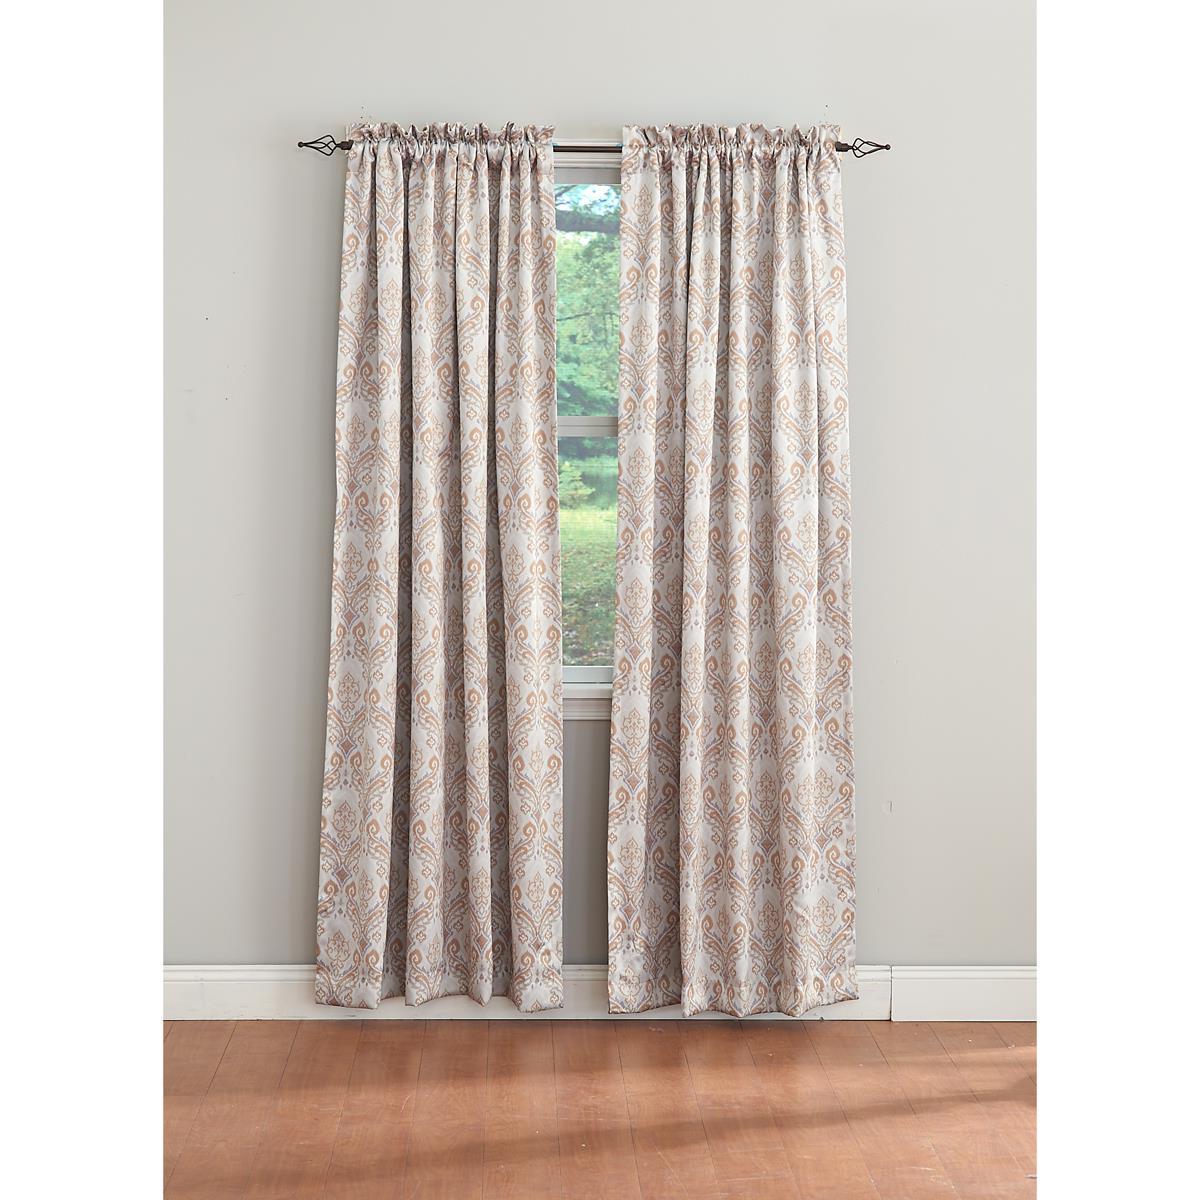 Damask Blackout Rod Pocket Curtain Panel Inside Most Current Rod Pocket Curtain Panels (View 18 of 20)